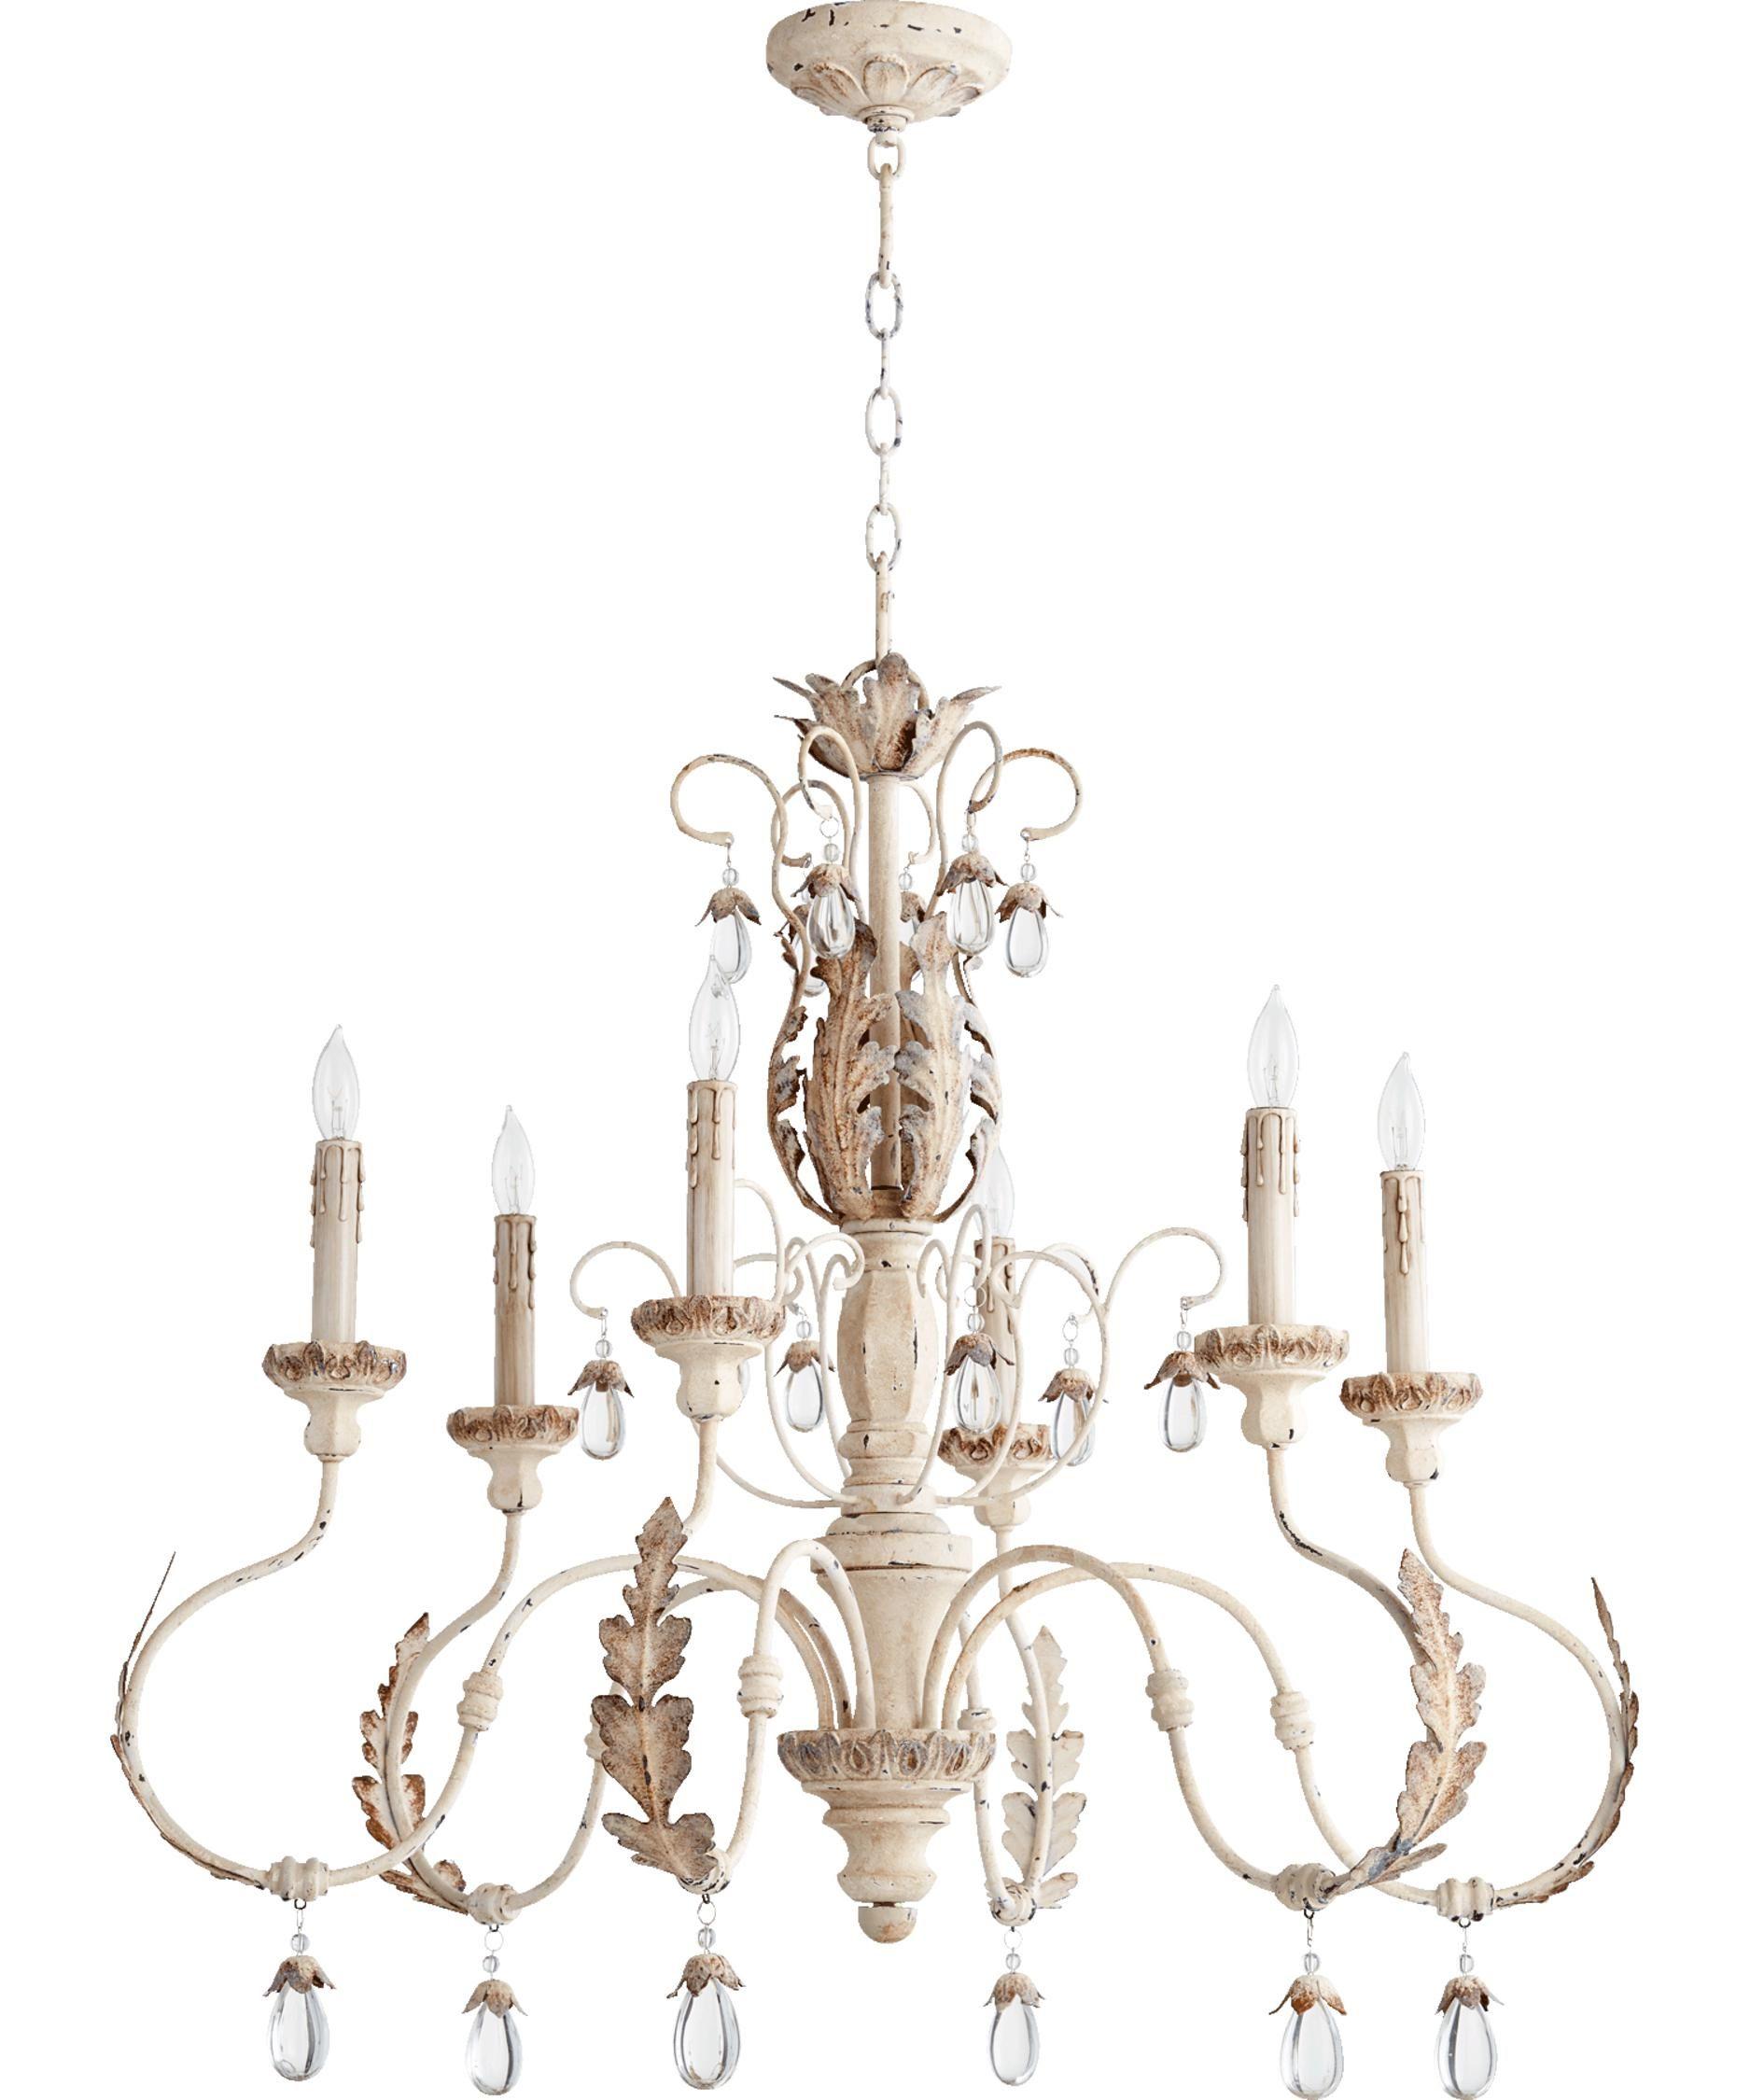 quorum international lighting semi flush quorum international 6444670 venice 32 inch wide light chandelier capitol lighting 1800lightingcom in 2018